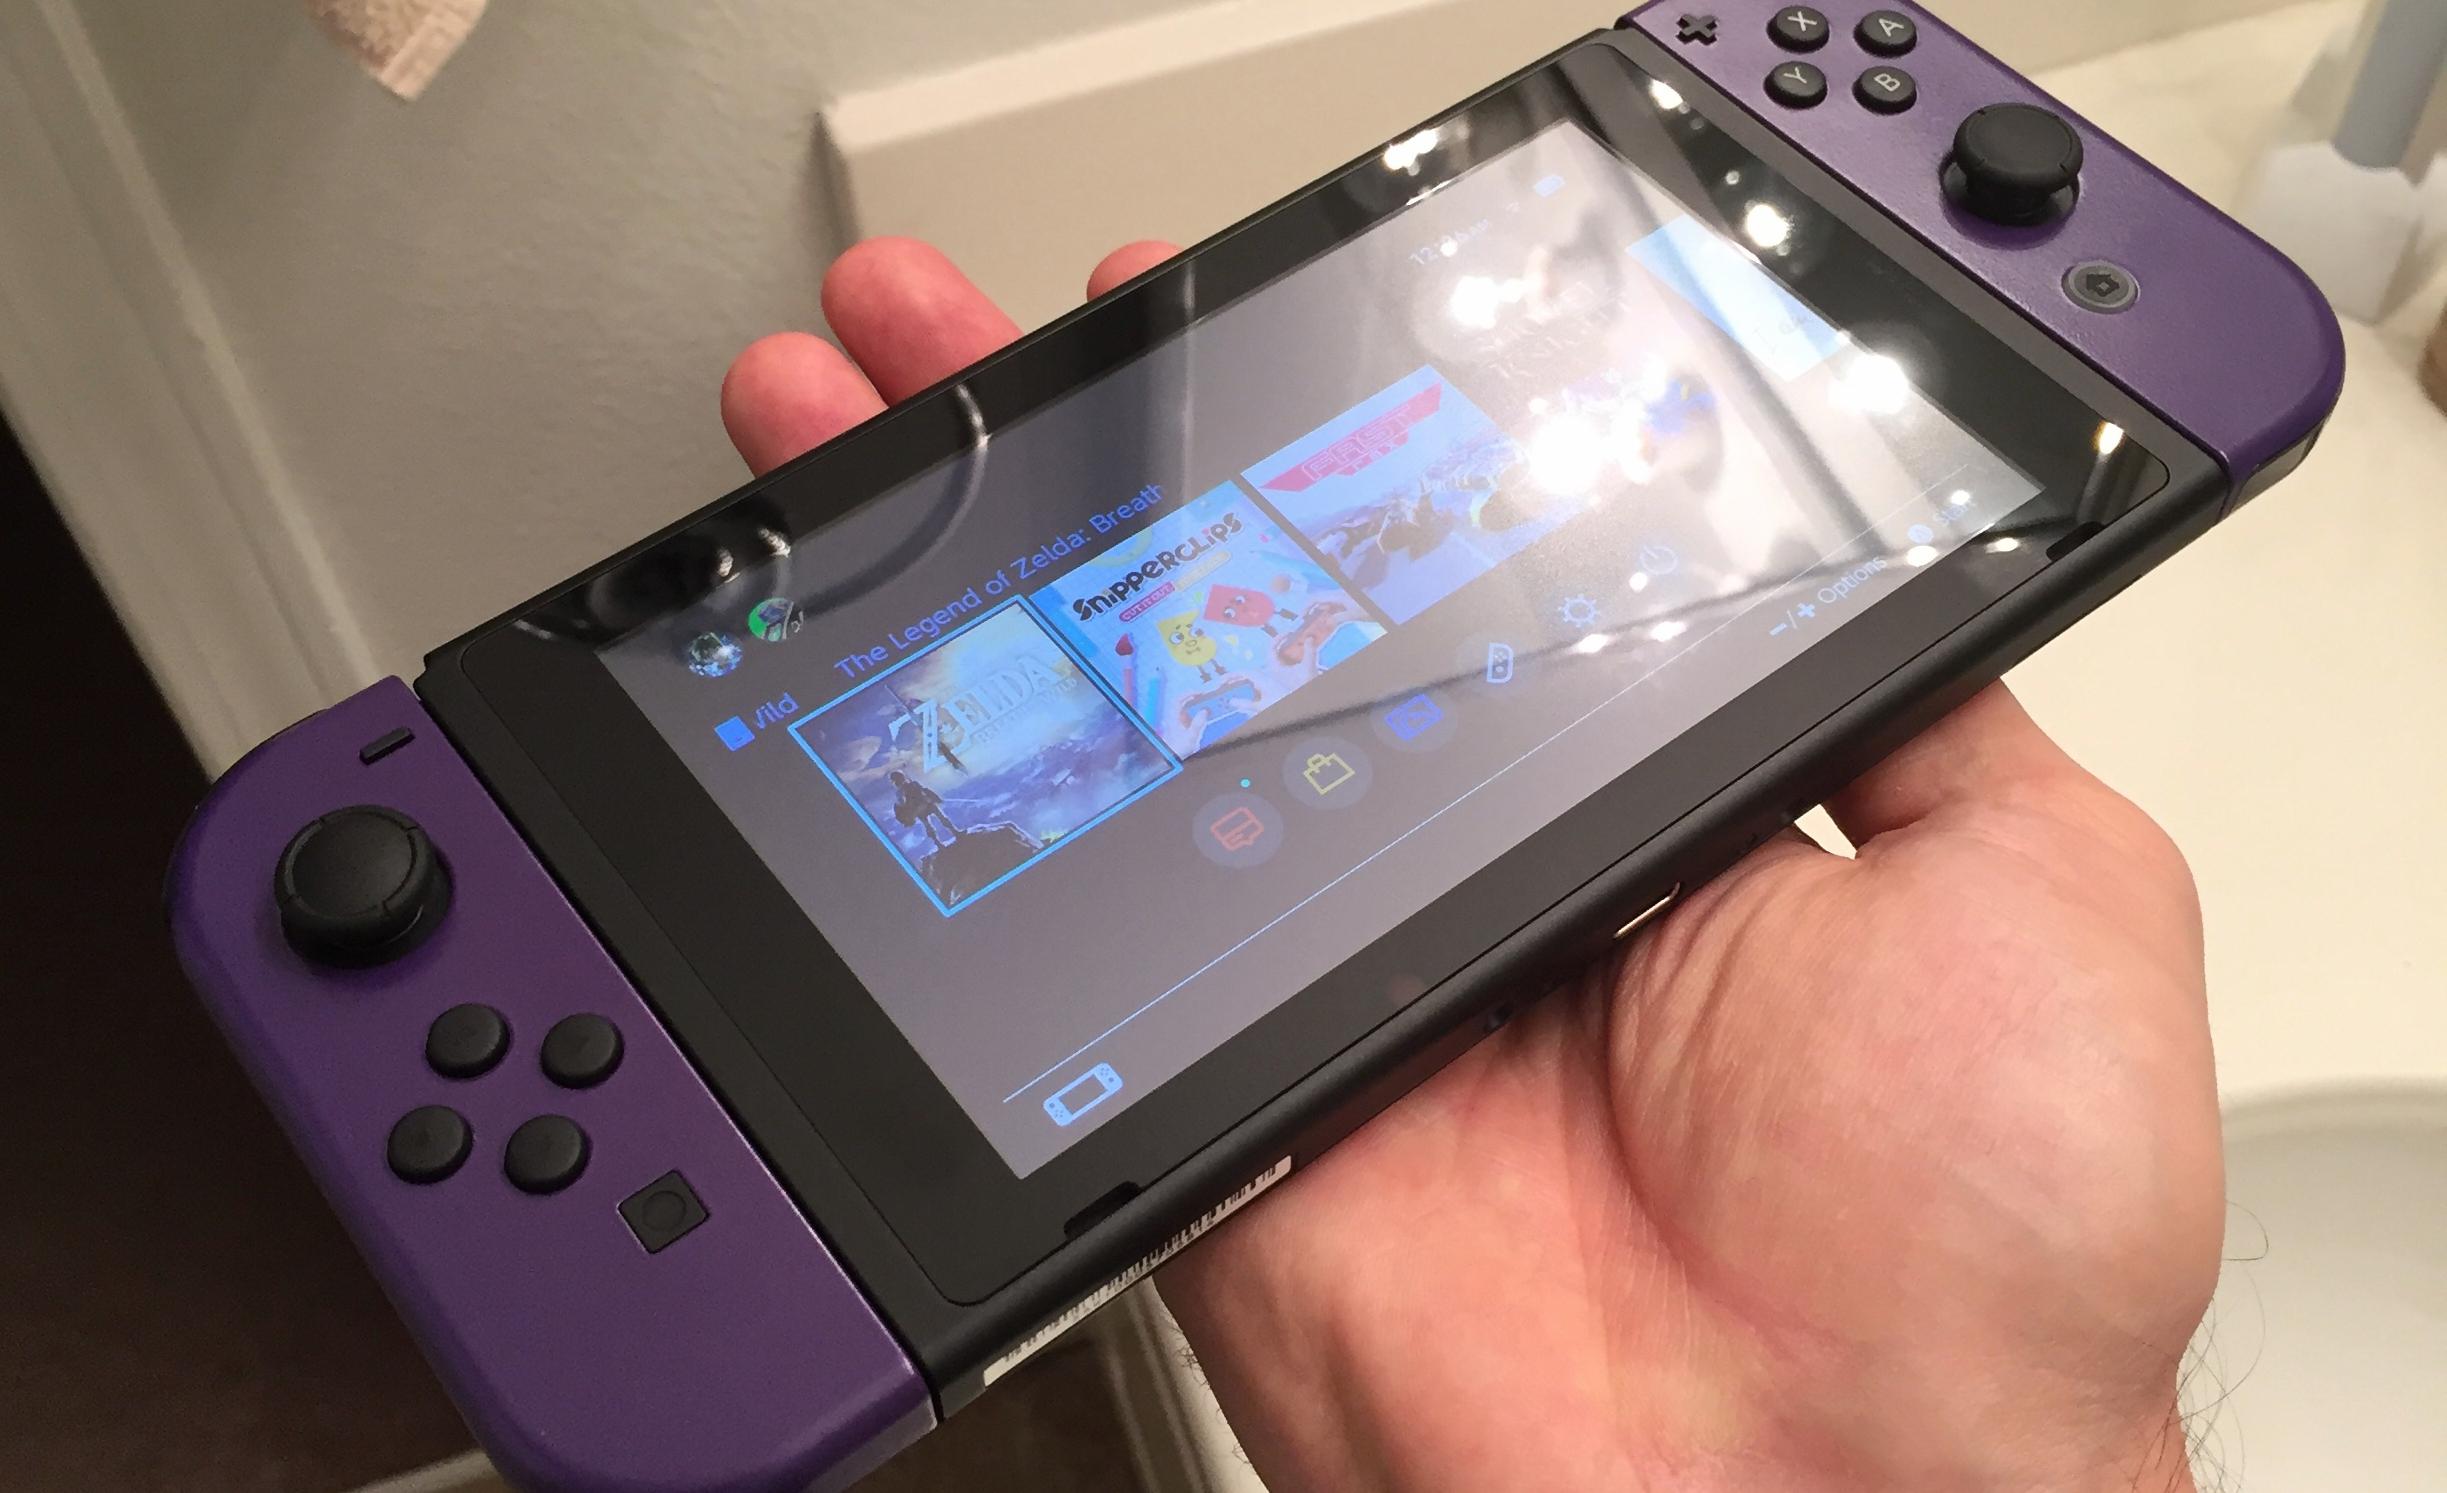 Hacker Publishes POC for Nintendo Switch Hack